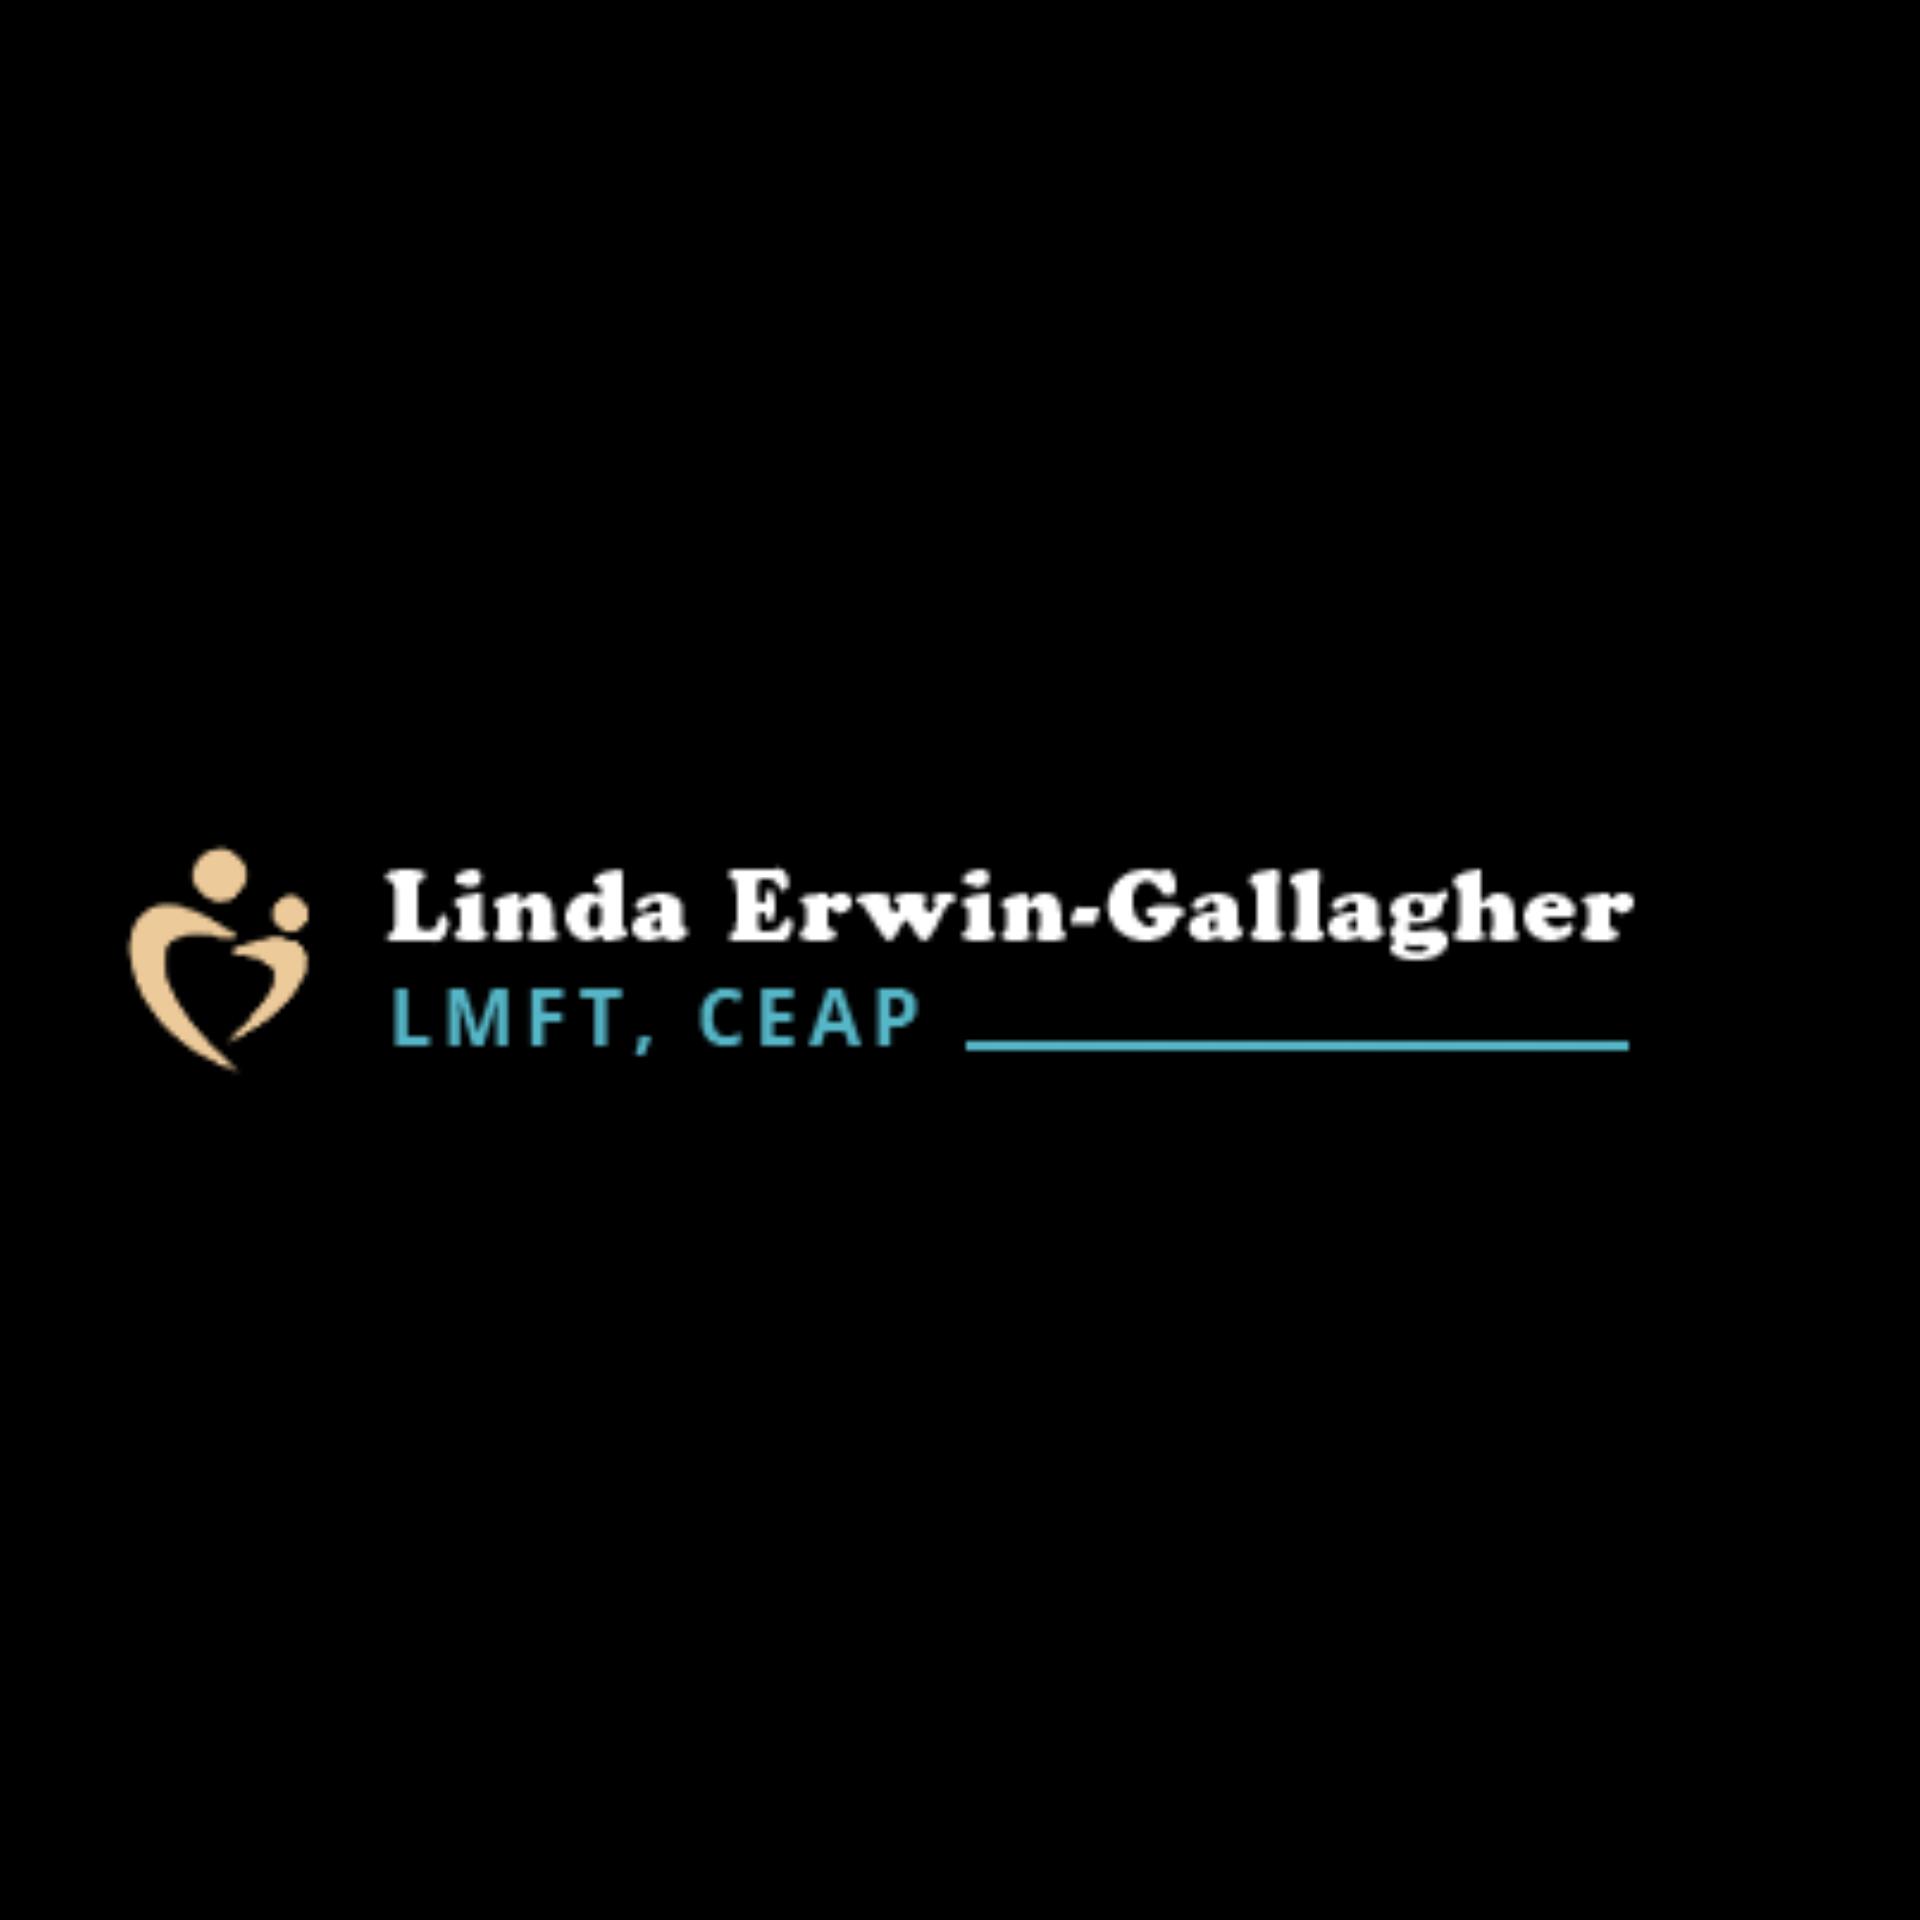 Linda Erwin Gallagher LMFT CEAP